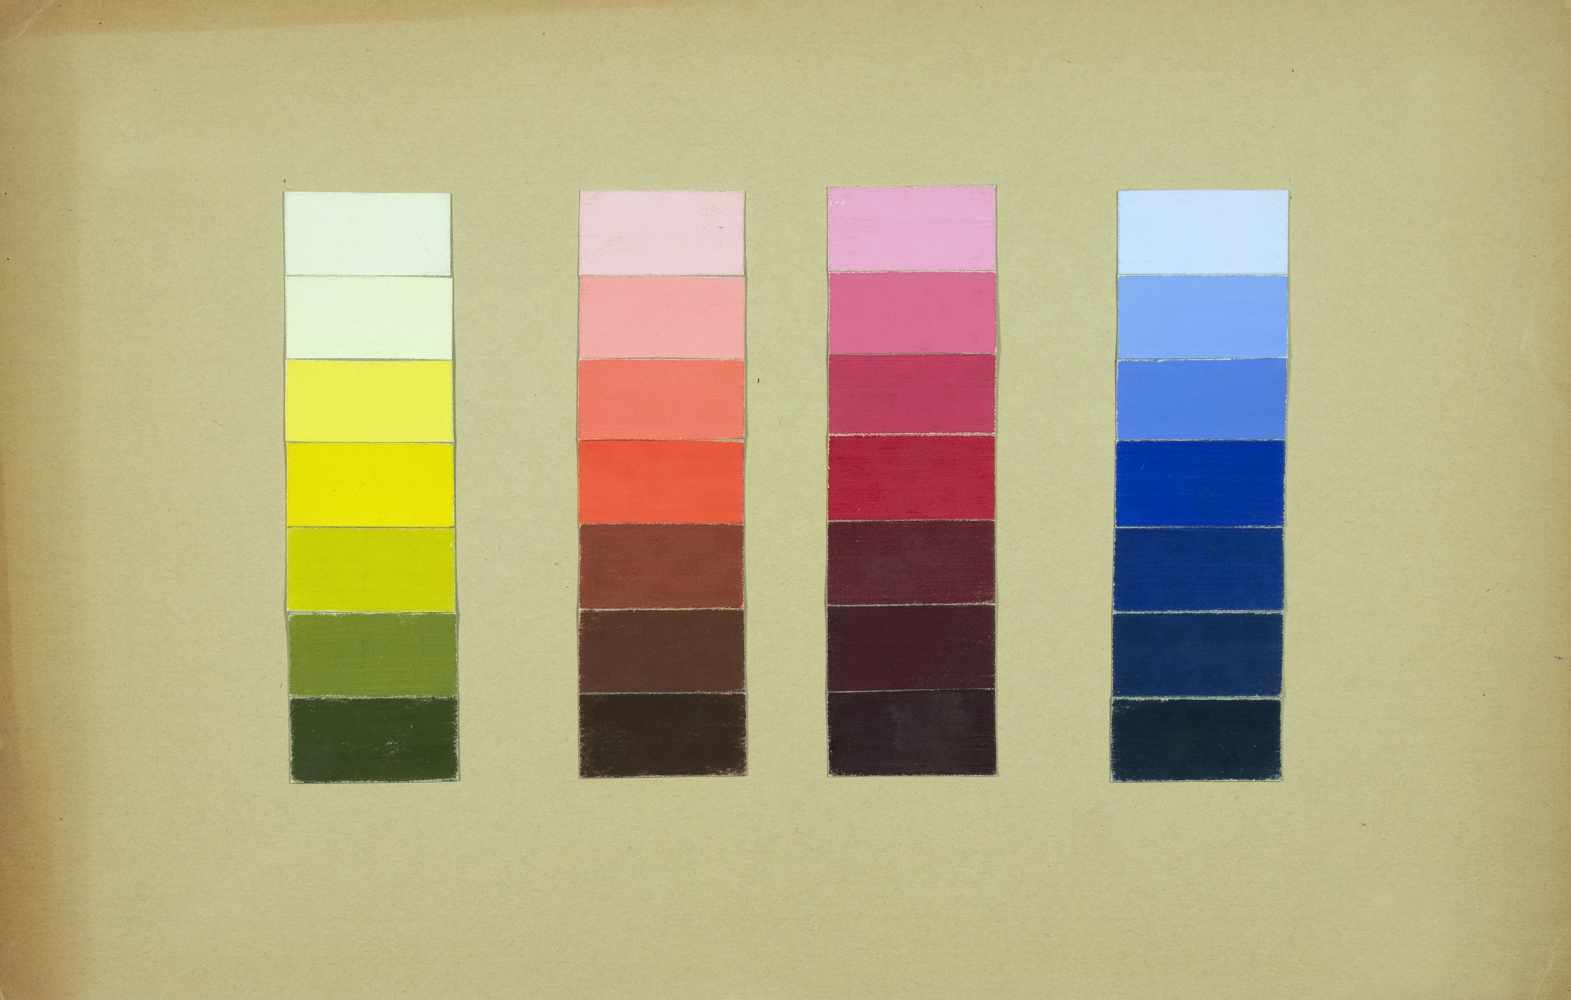 Bauhaus - Walter Köppe. Unterricht Kandinsky. Farbspektren. 28 collagierte Temperafarbflächen auf